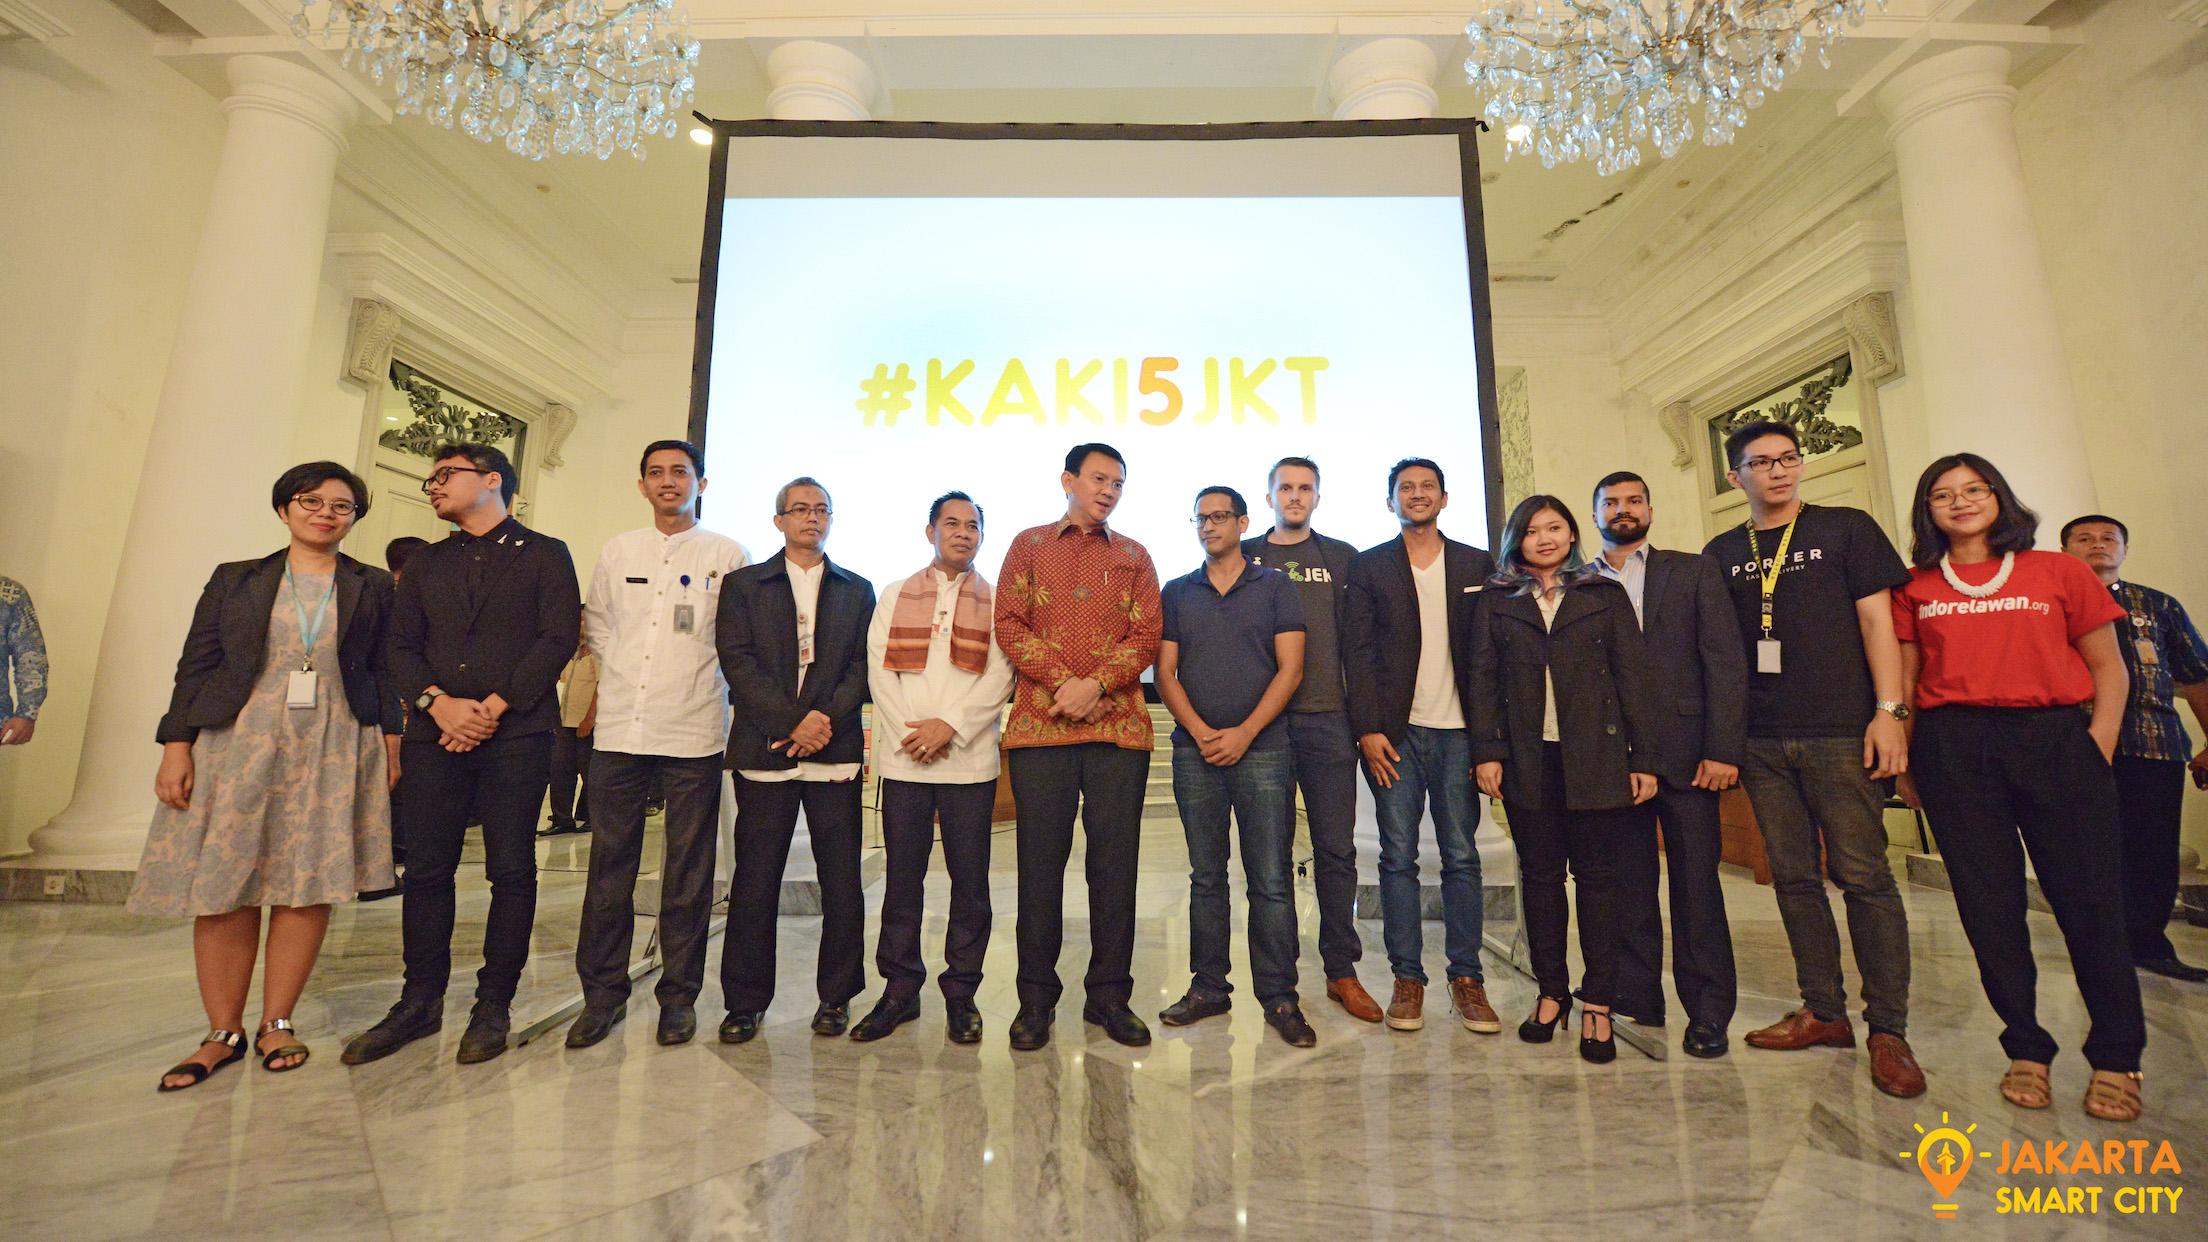 Gubernur Provinsi DKI Jakarta Basuki Tjahaja Purnama bersama pelaku startup dan komunitas di acara peresmian KAKI5JKT /  UP Jakarta Smart City